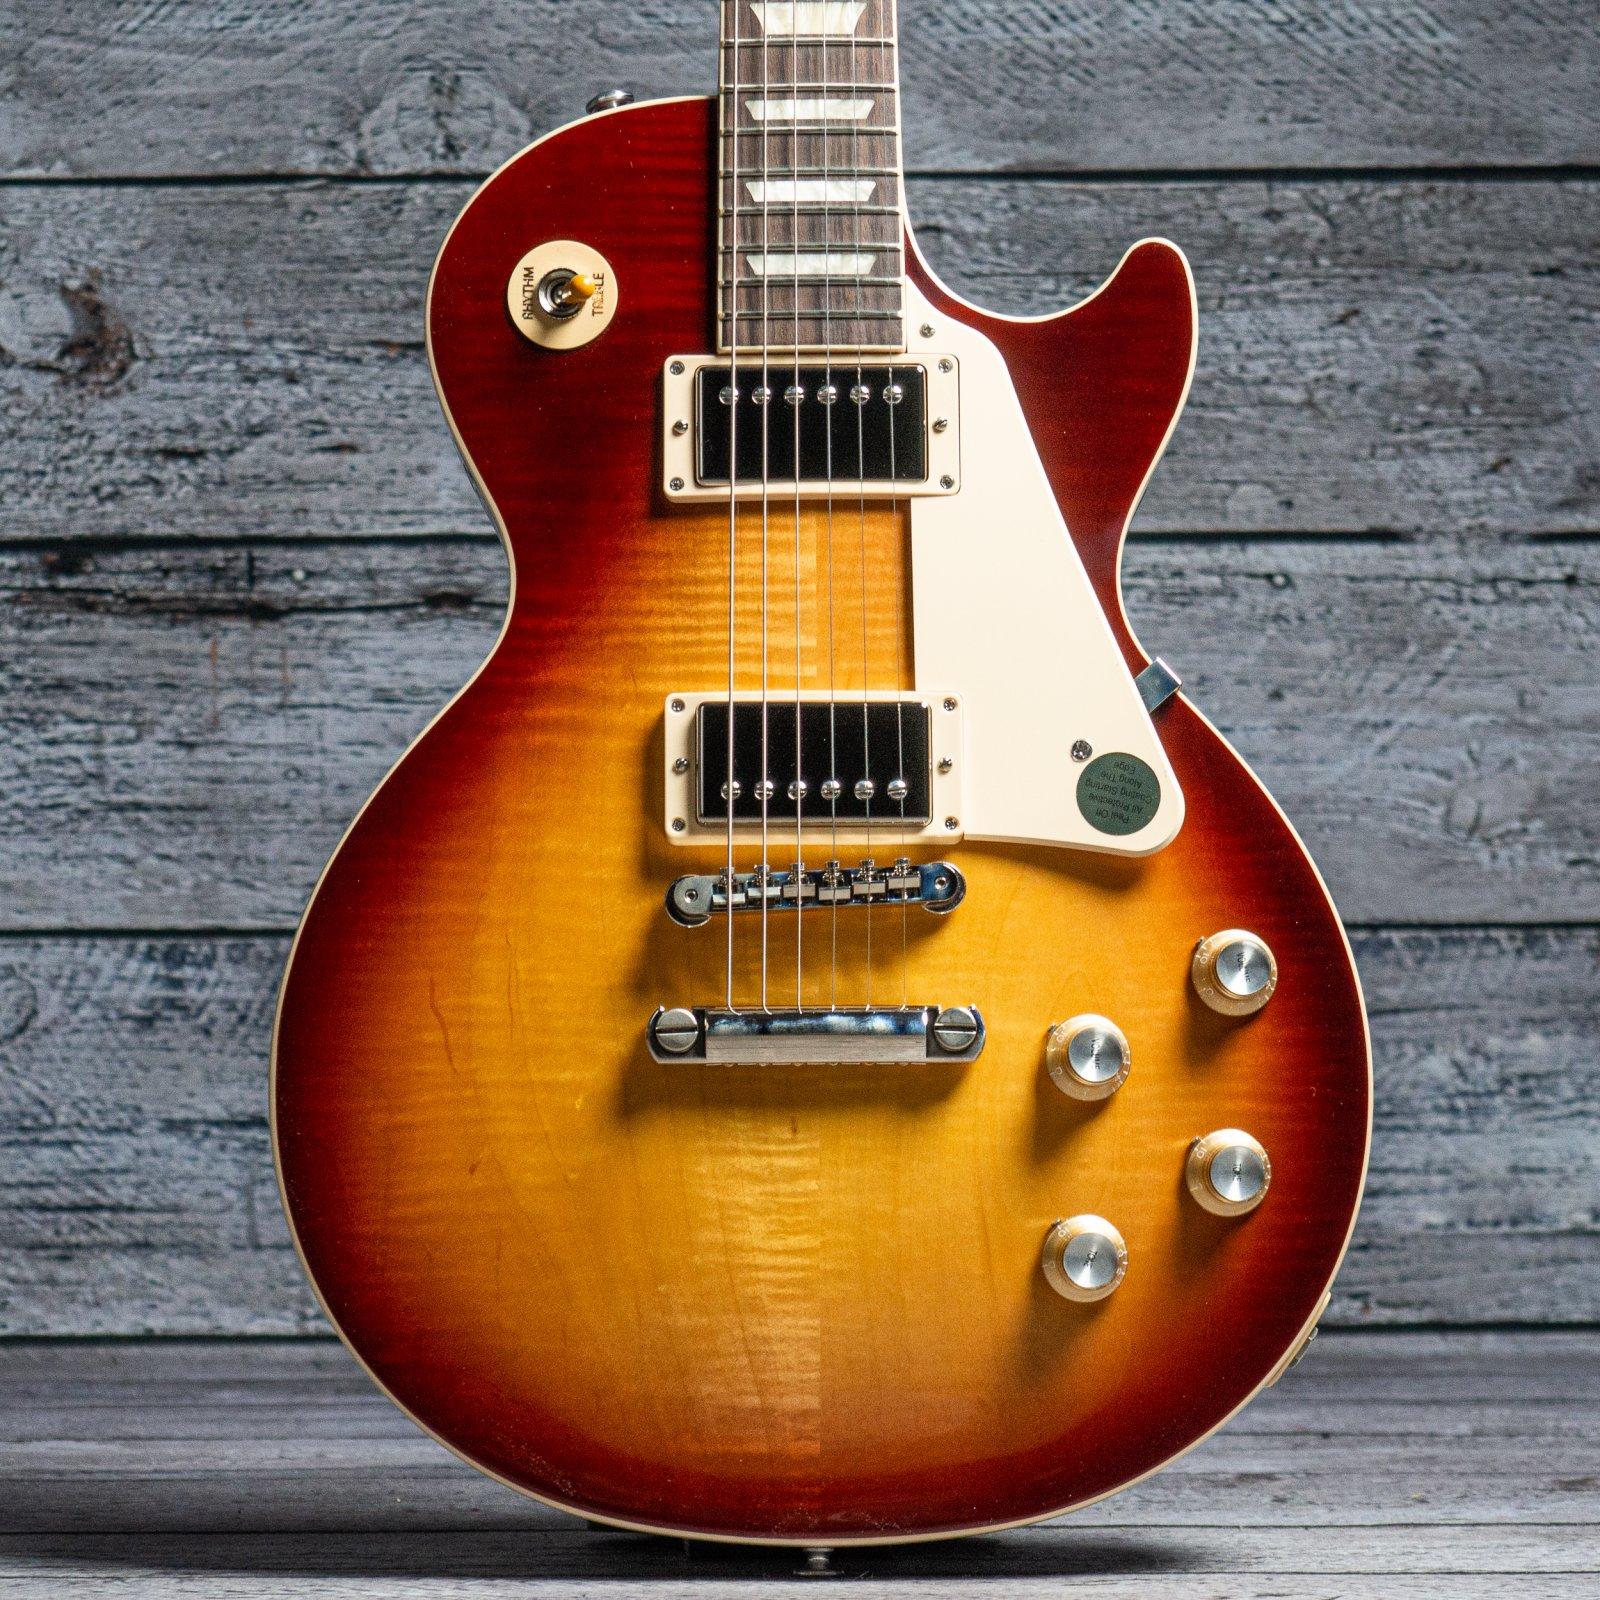 Gibson Les Paul Standard '60s Figured Top - Bourbon Burst (Serial: 200810127)